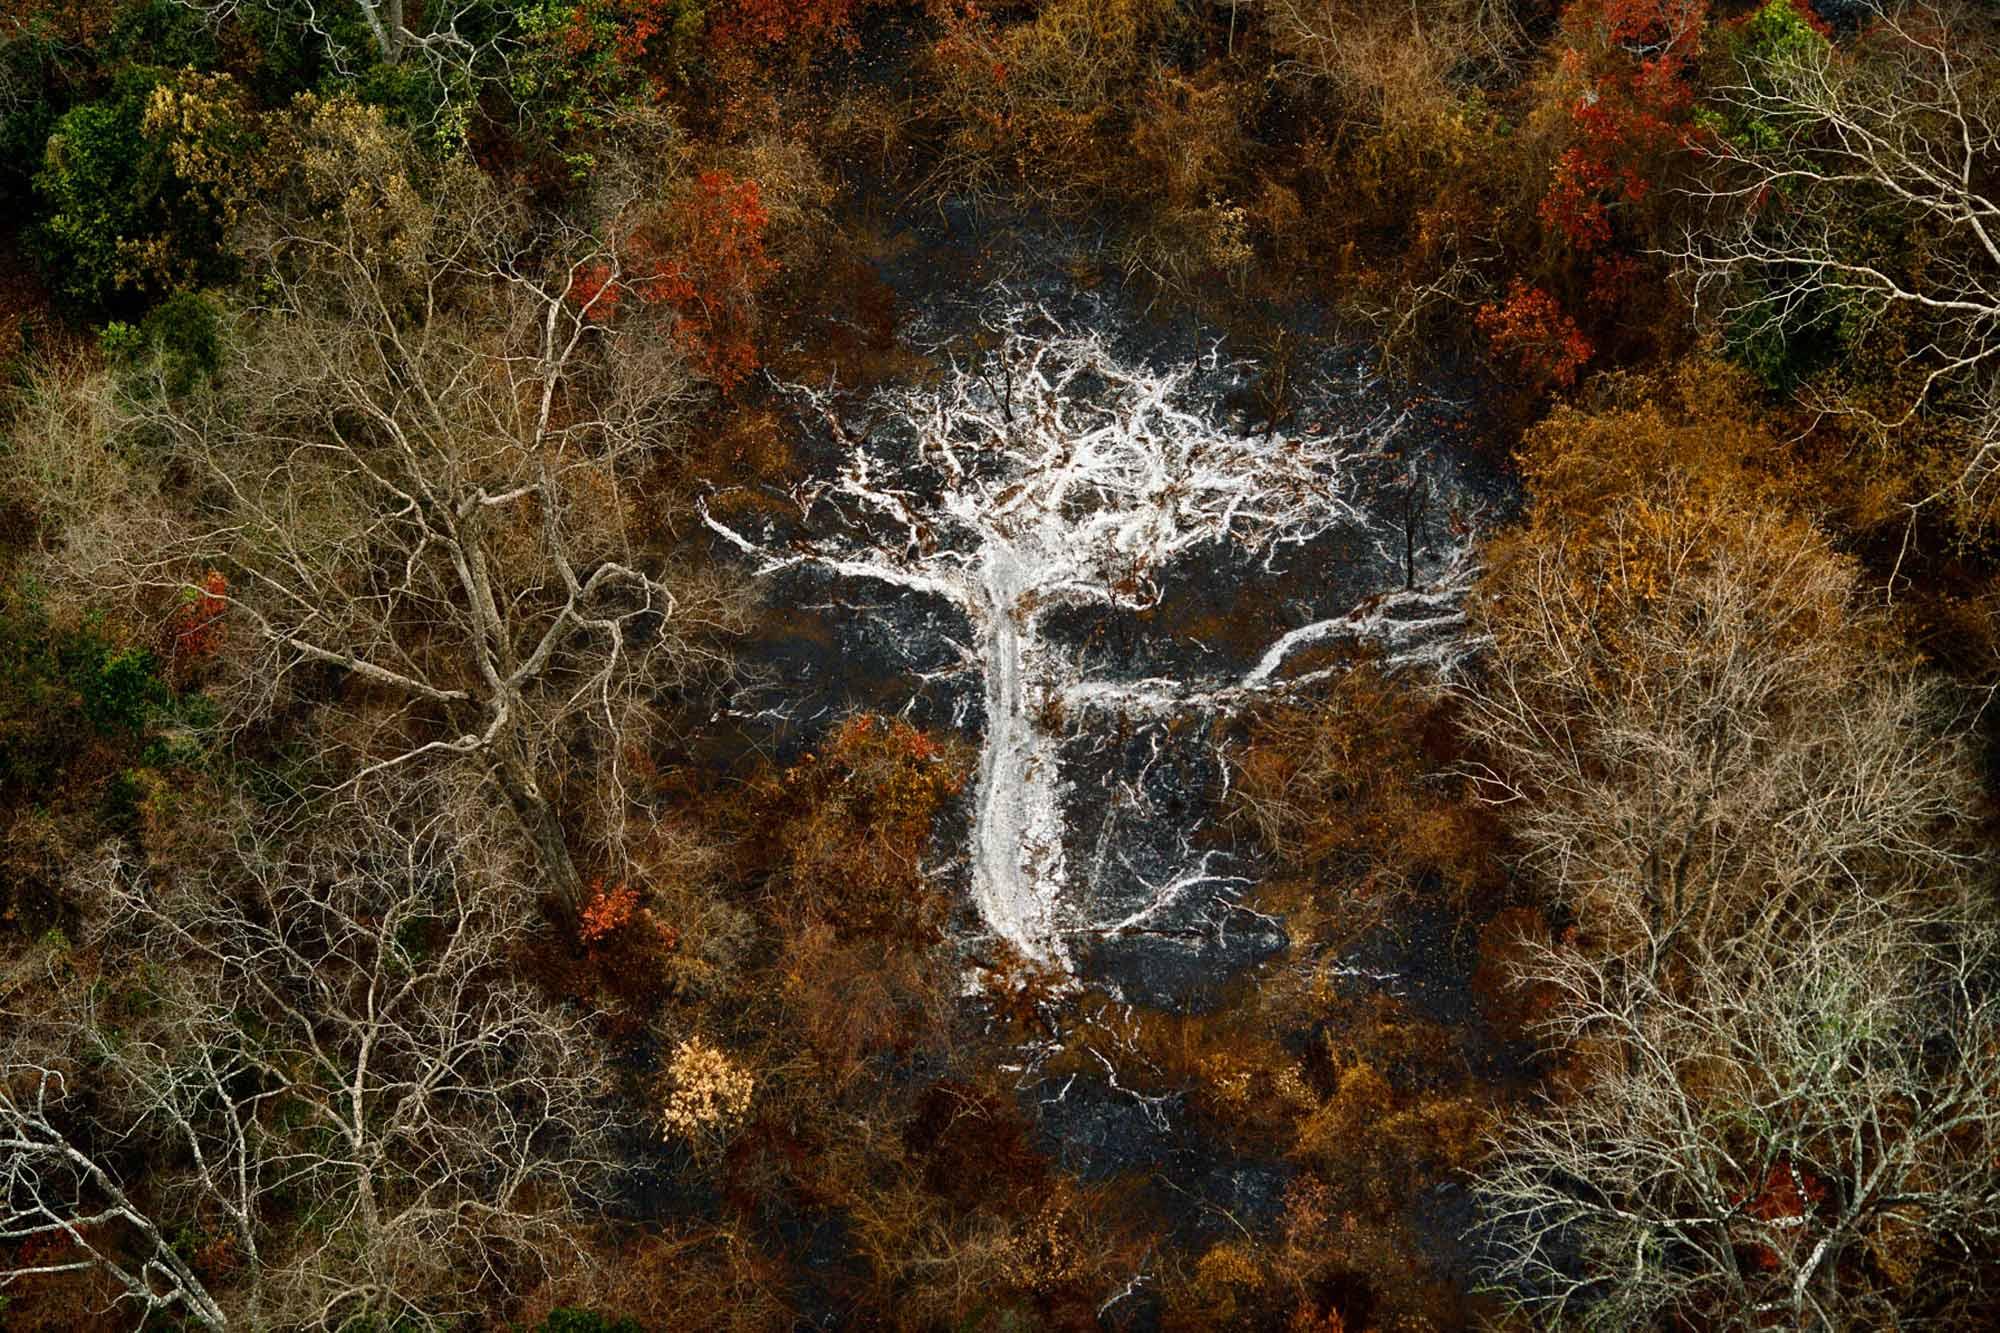 Ashes - Yann Arthus-Bertrand